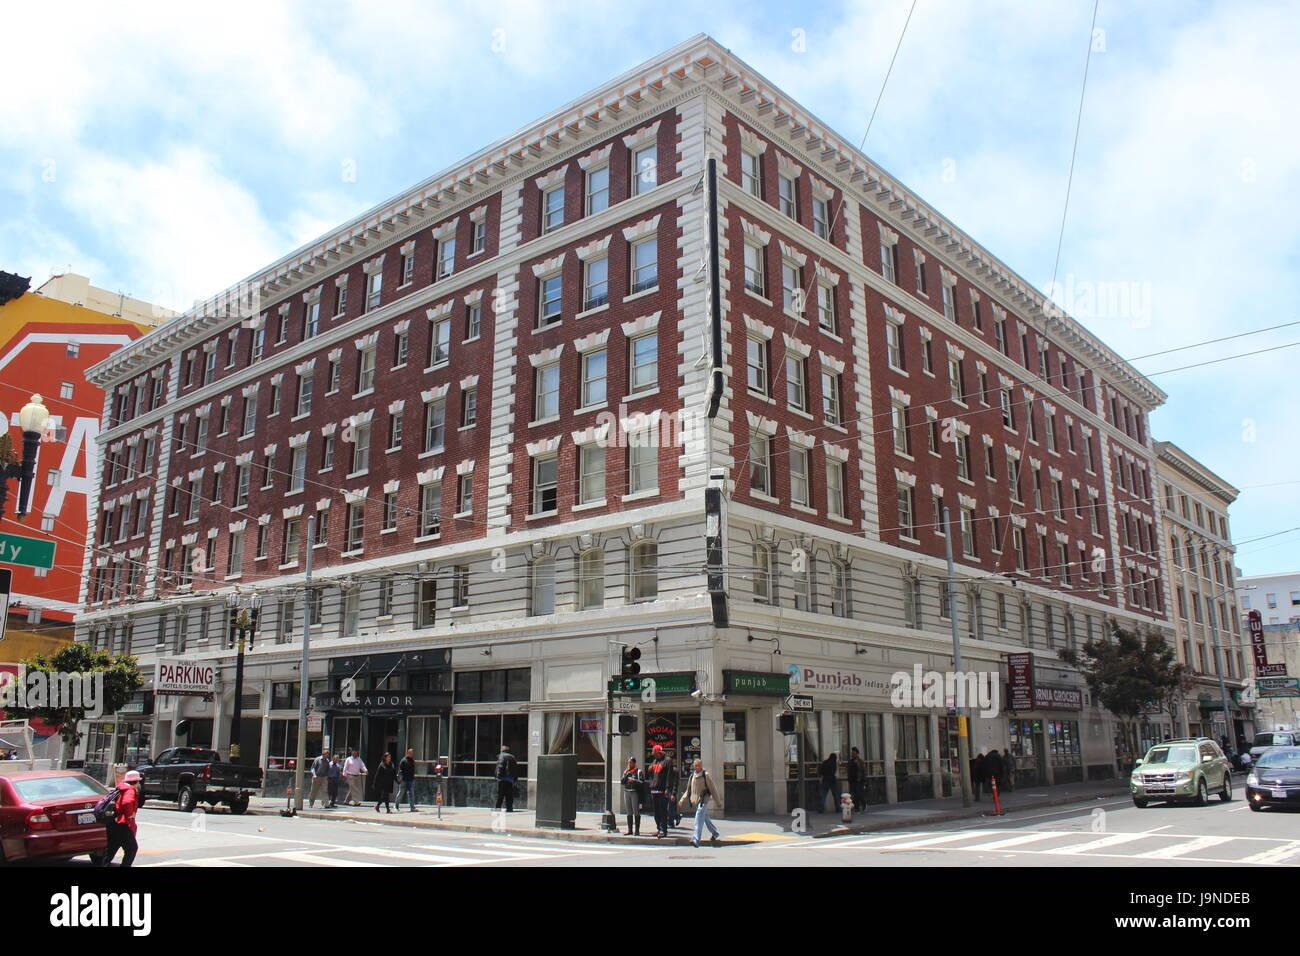 Hotel Ambassador, built 1911, Tenderloin, San Francisco, California - Stock Image